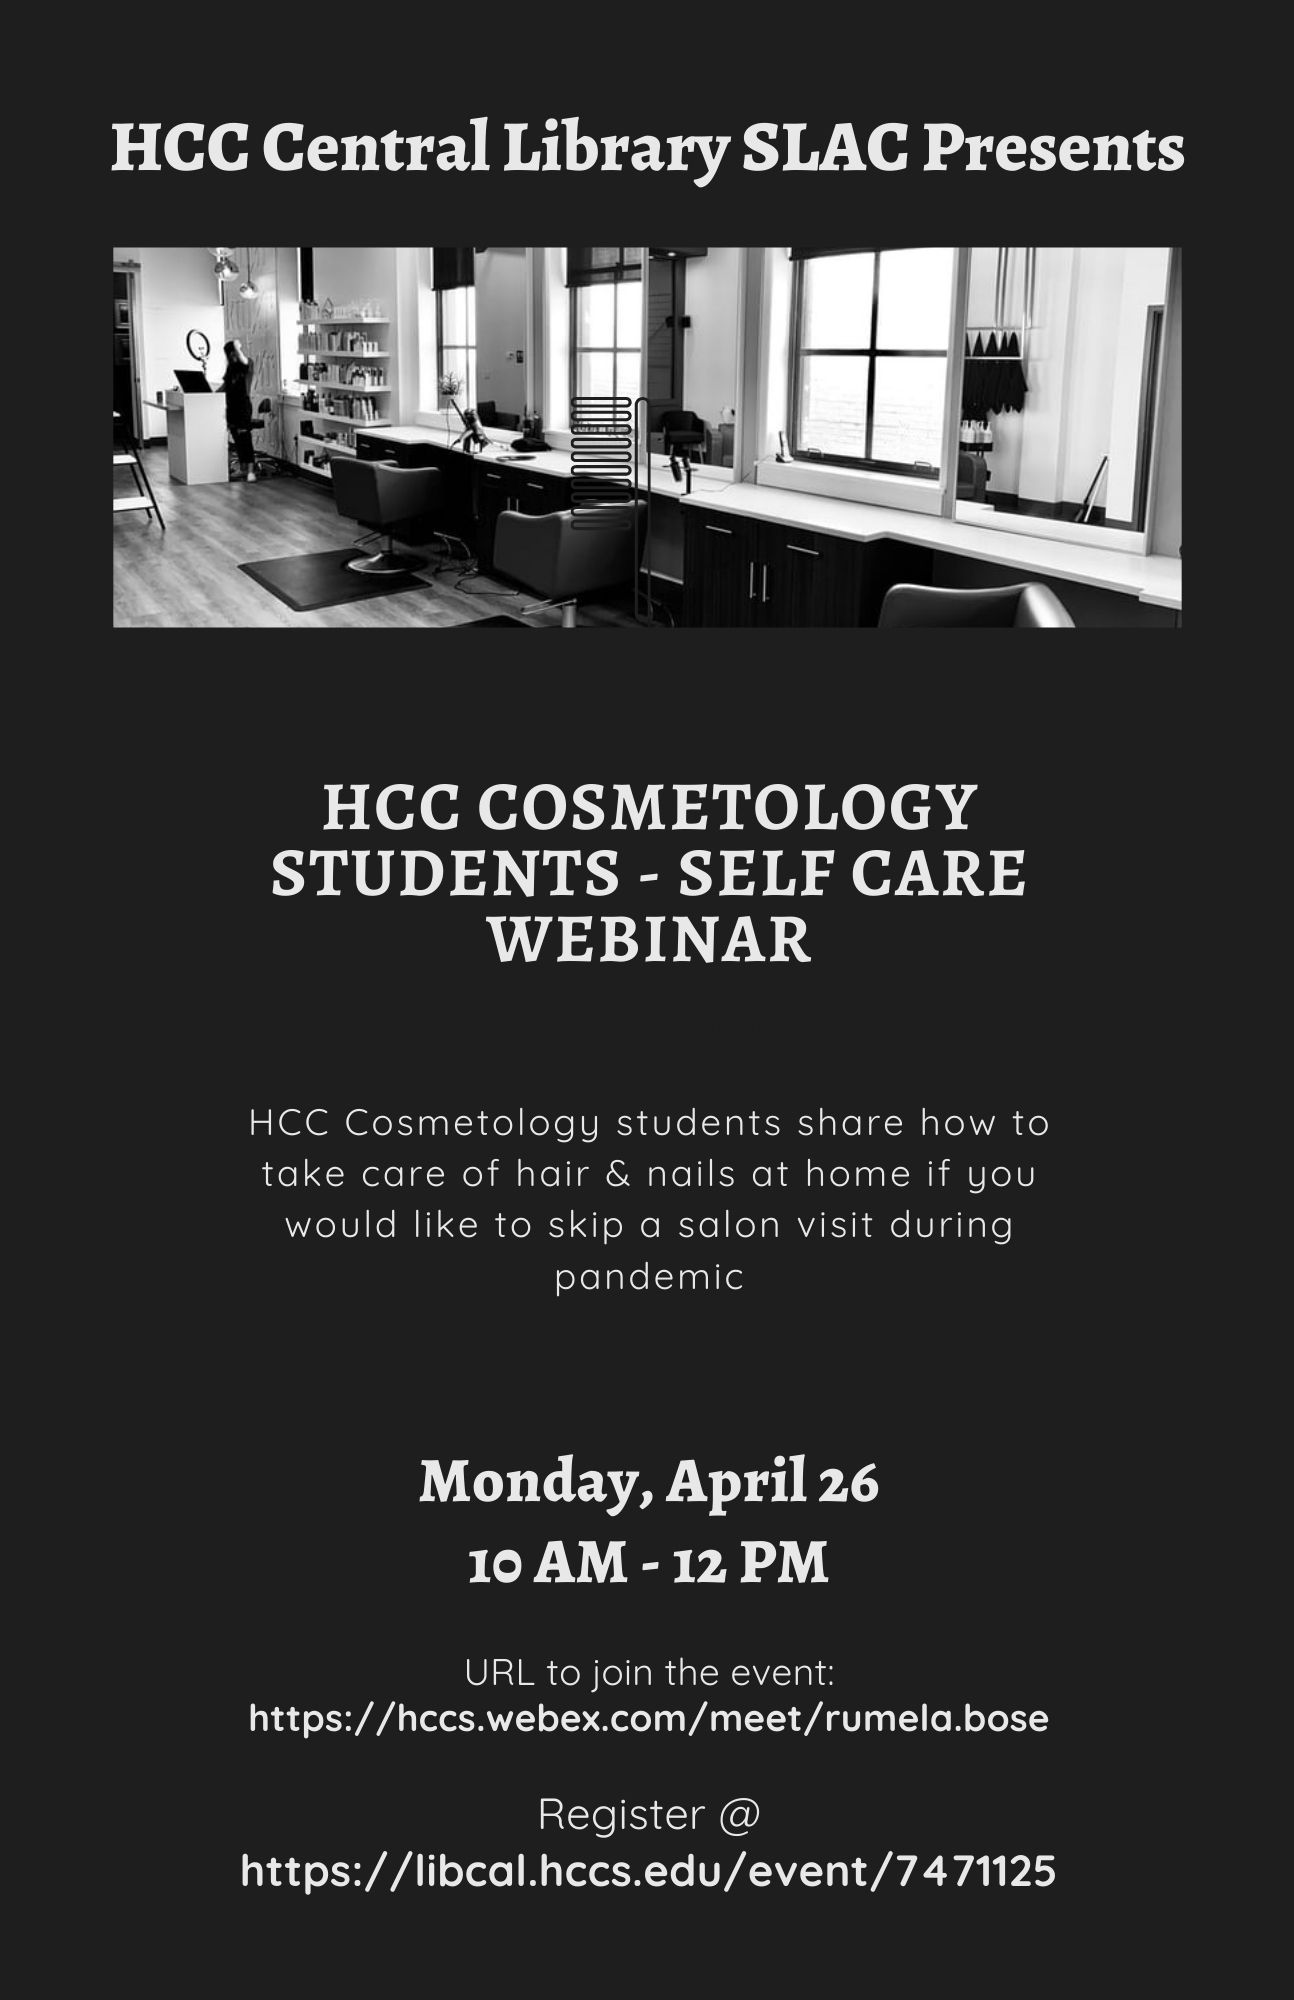 HCC Cosmetology Student - Self Care Webinar